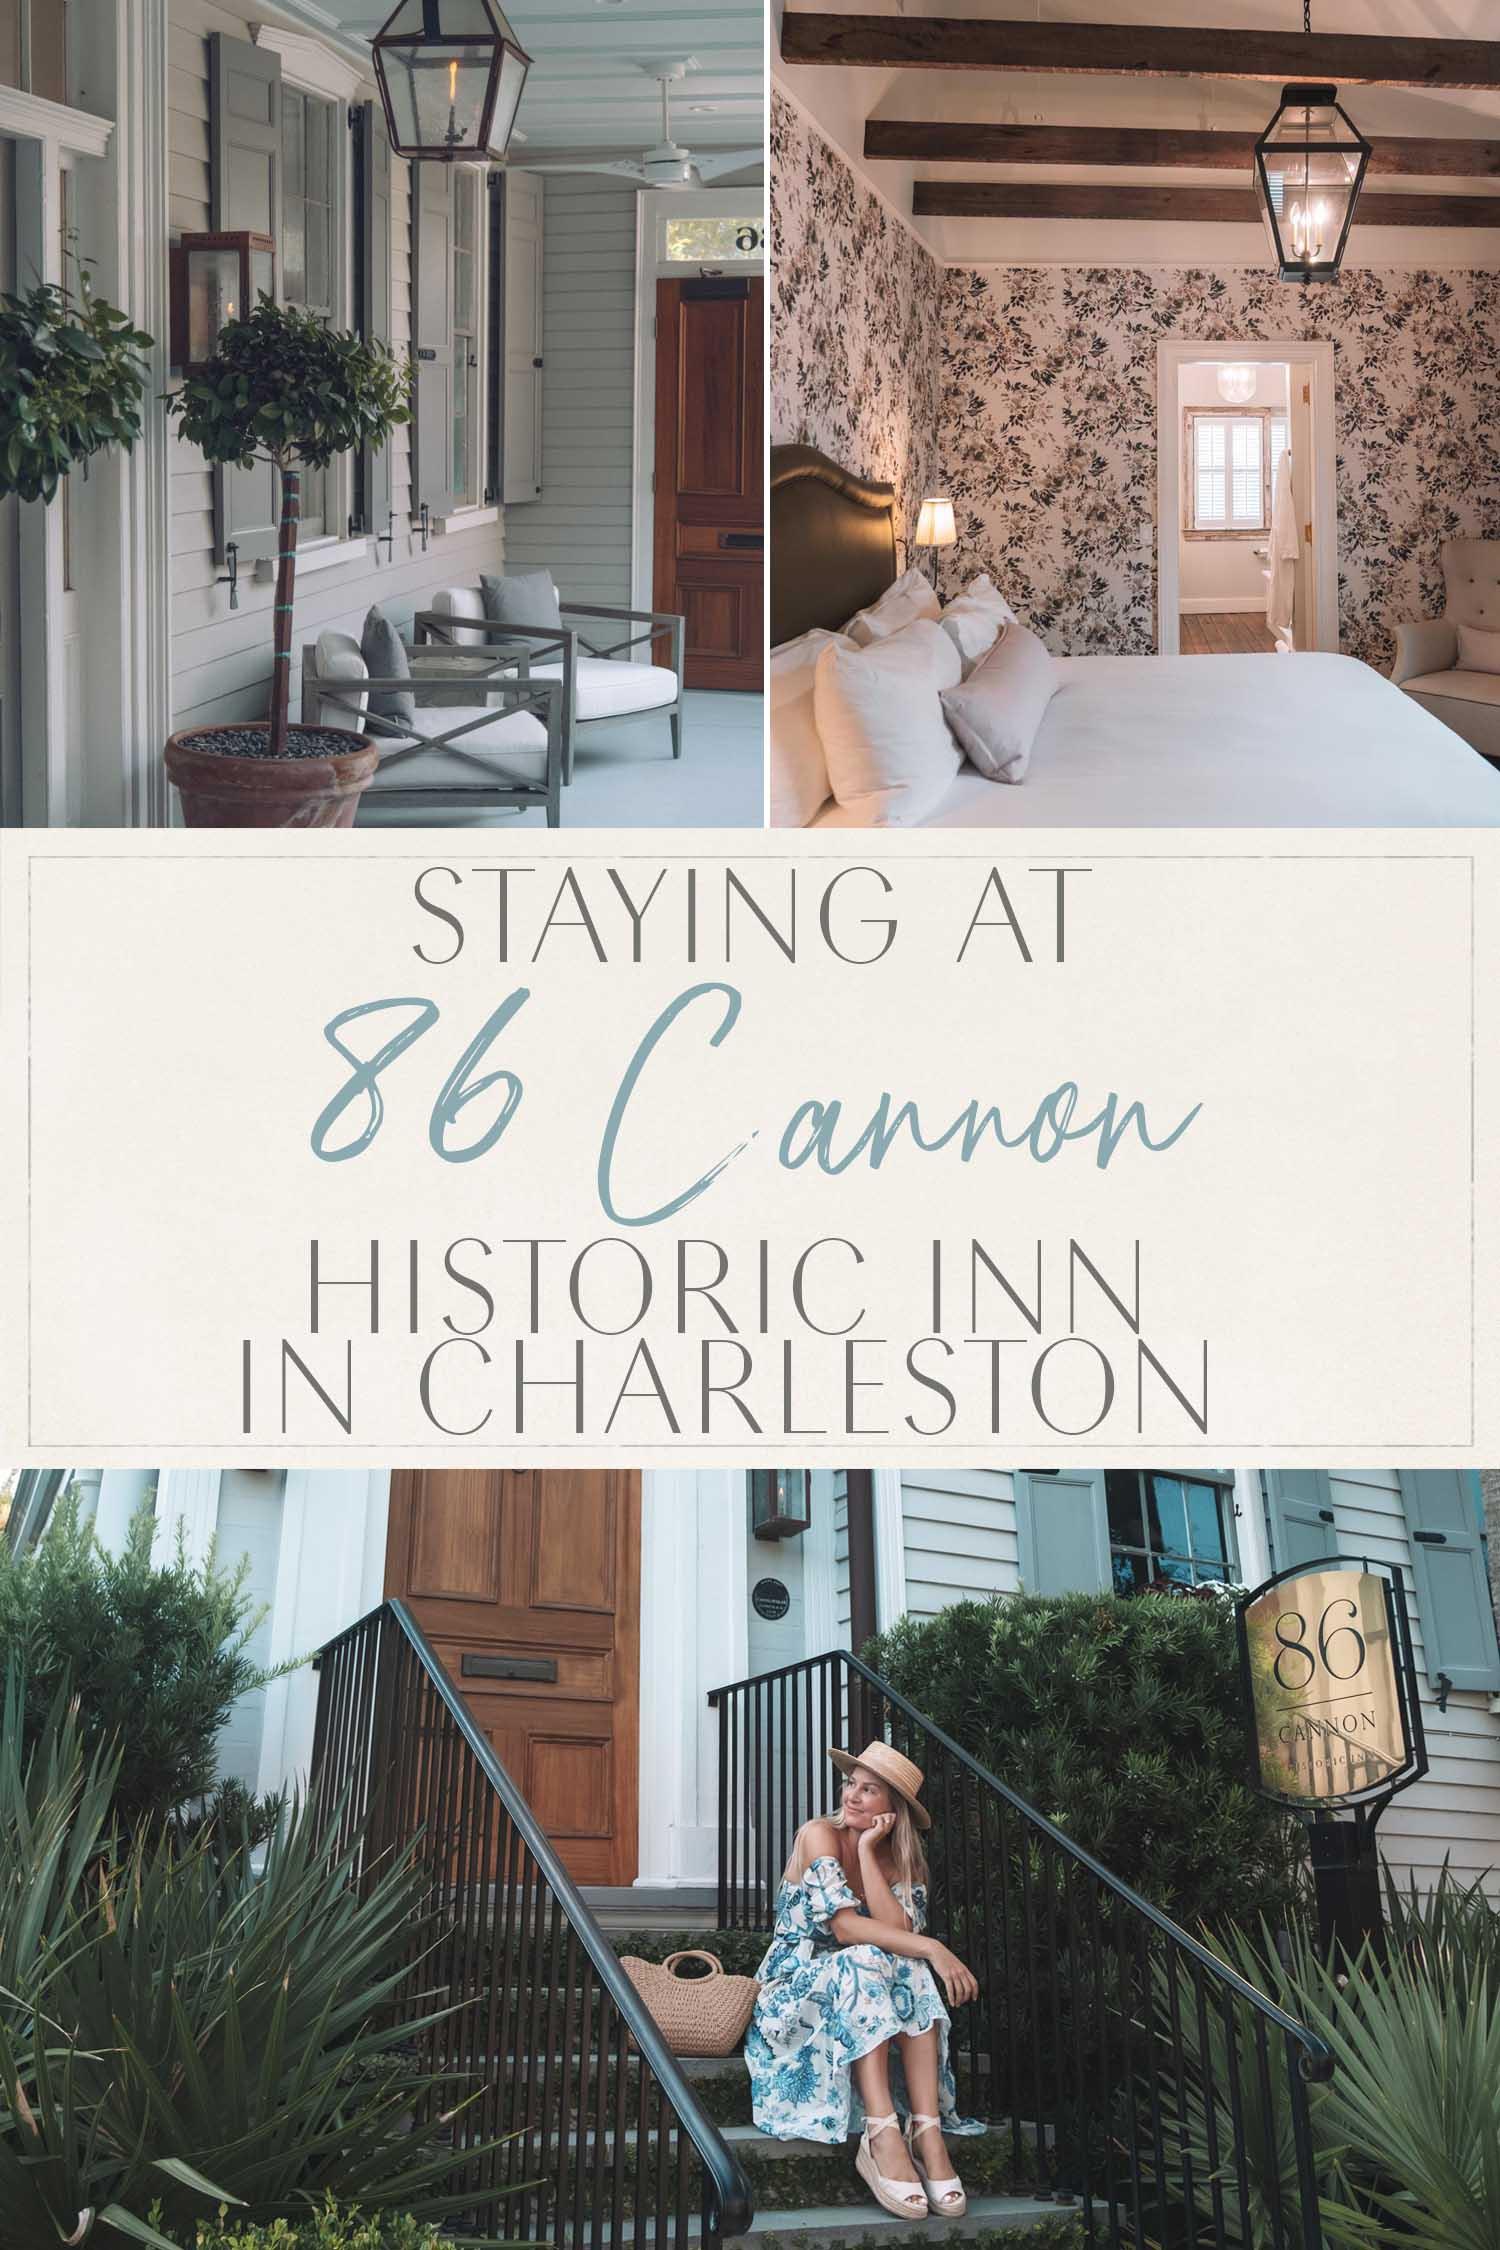 Staying at 86 Cannon Charleston